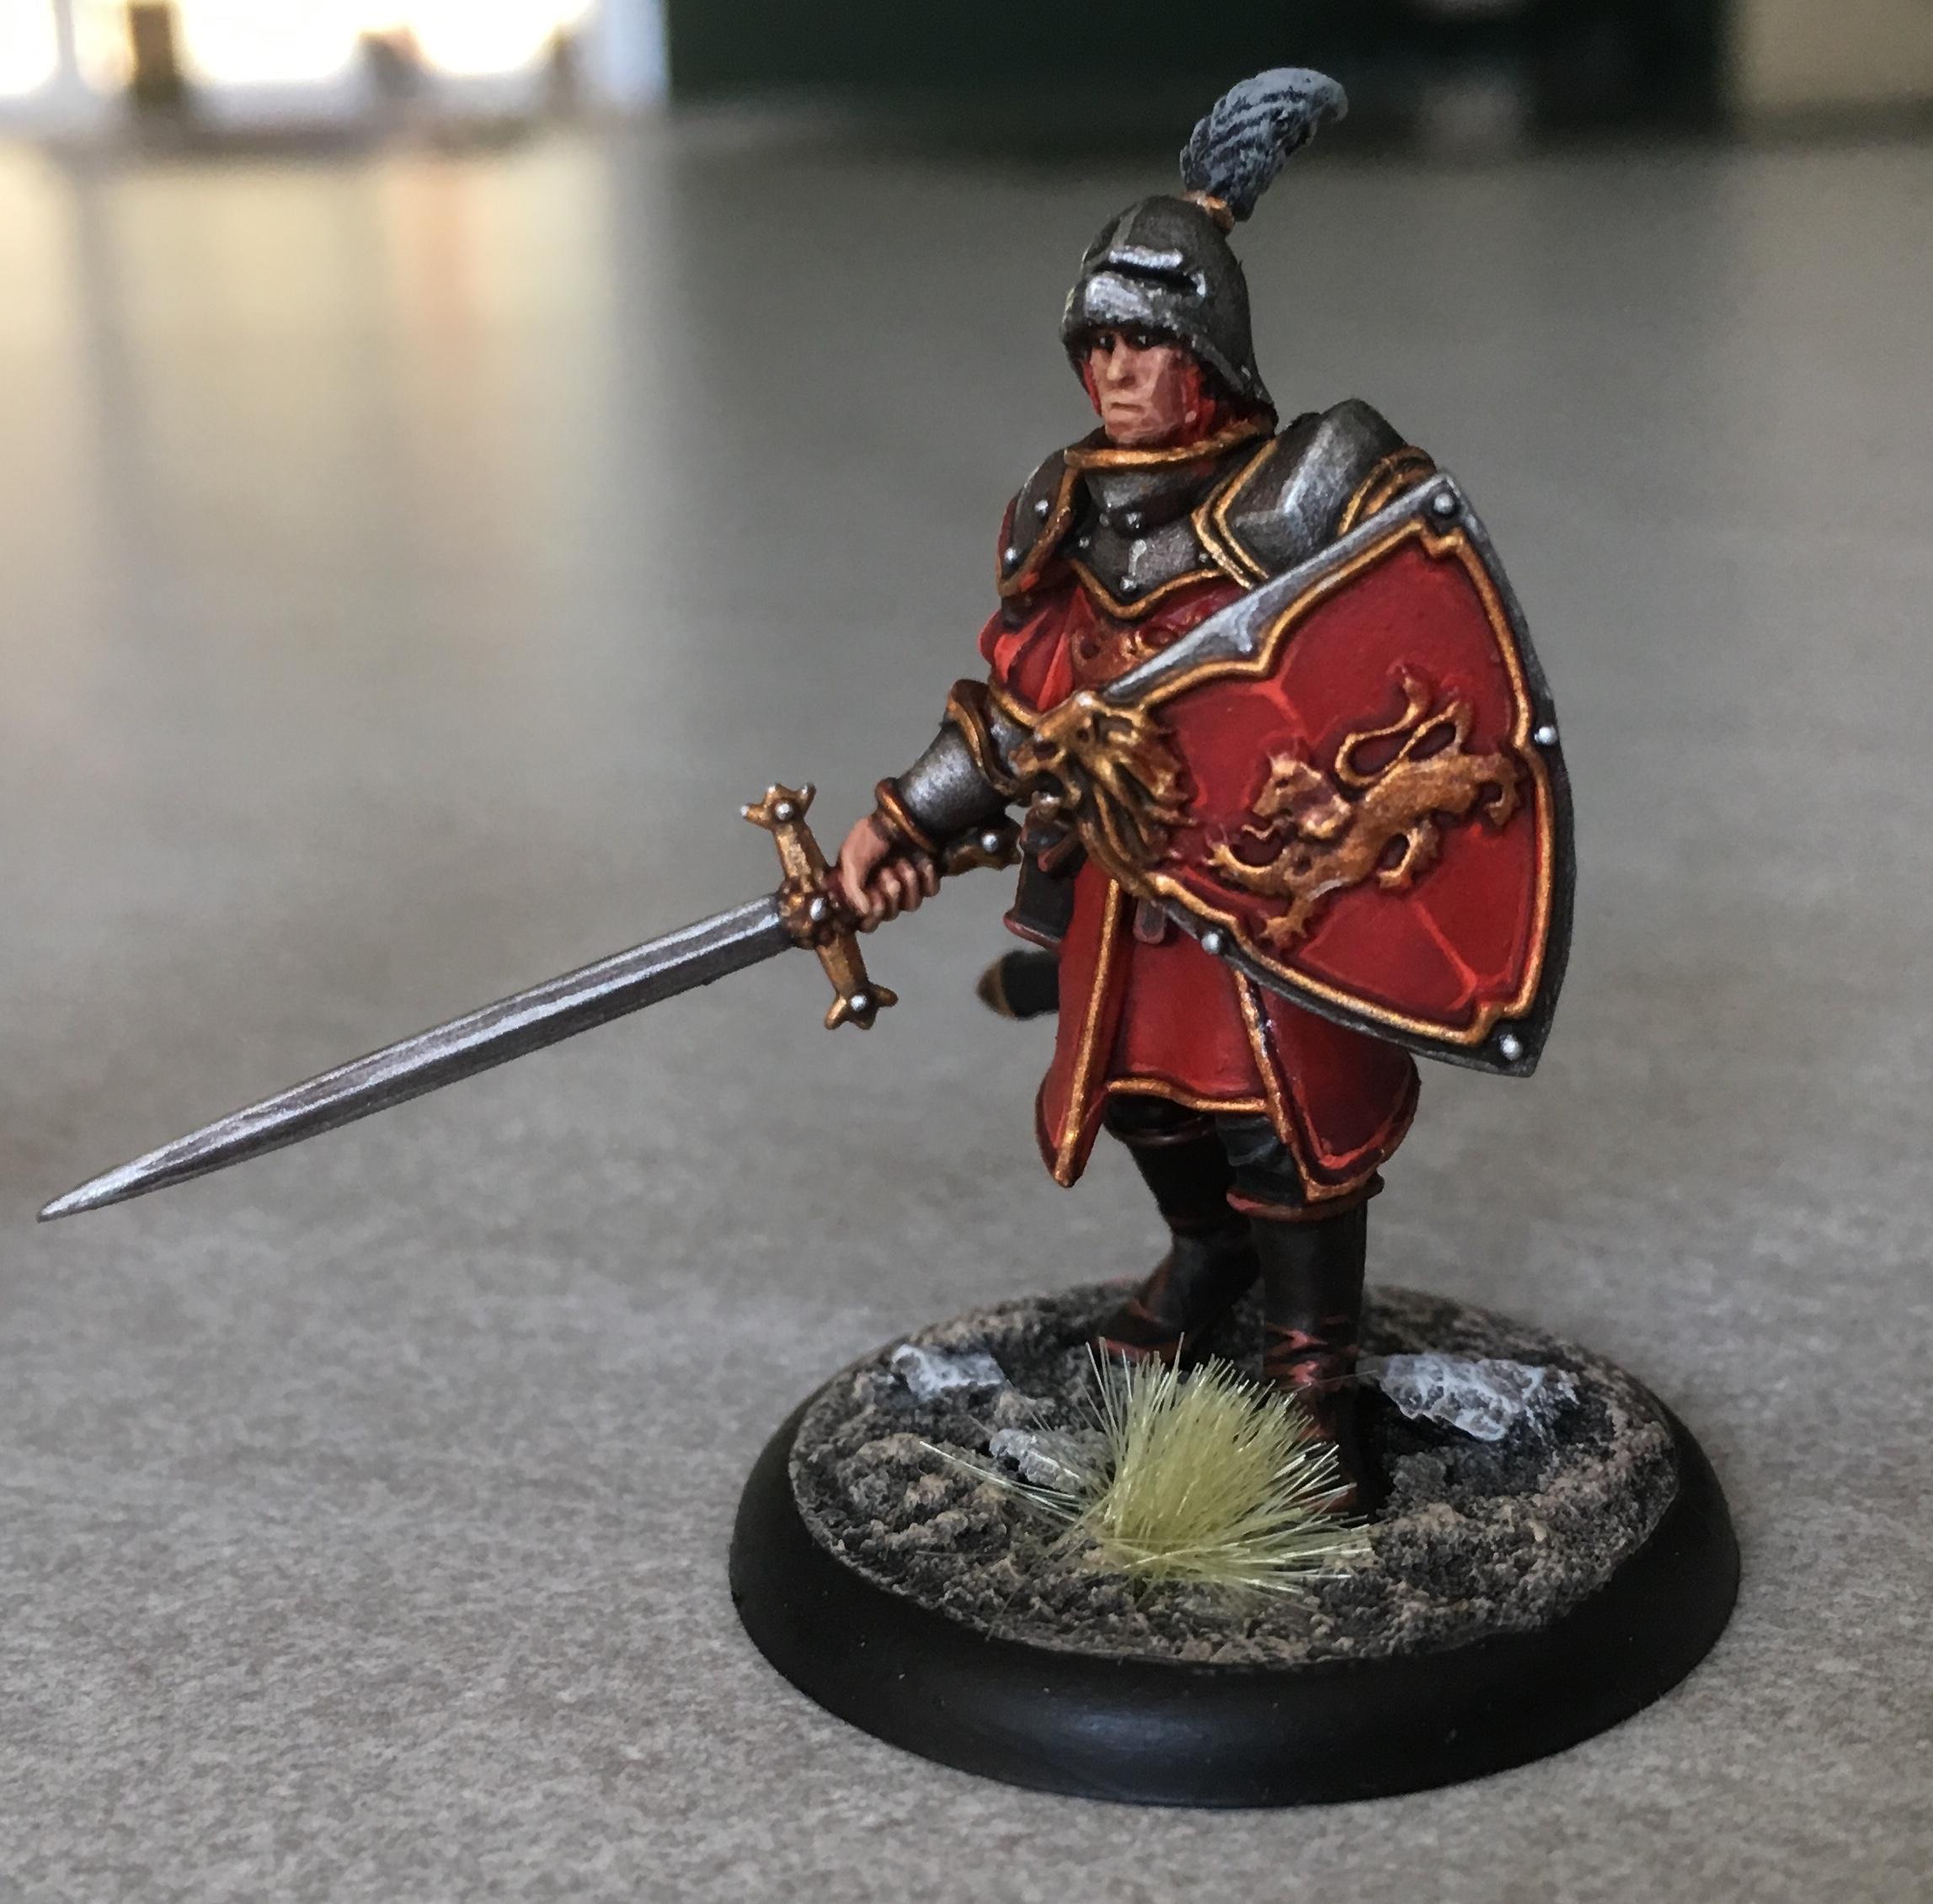 Asoiaf, Game Of Thrones, Swordsman